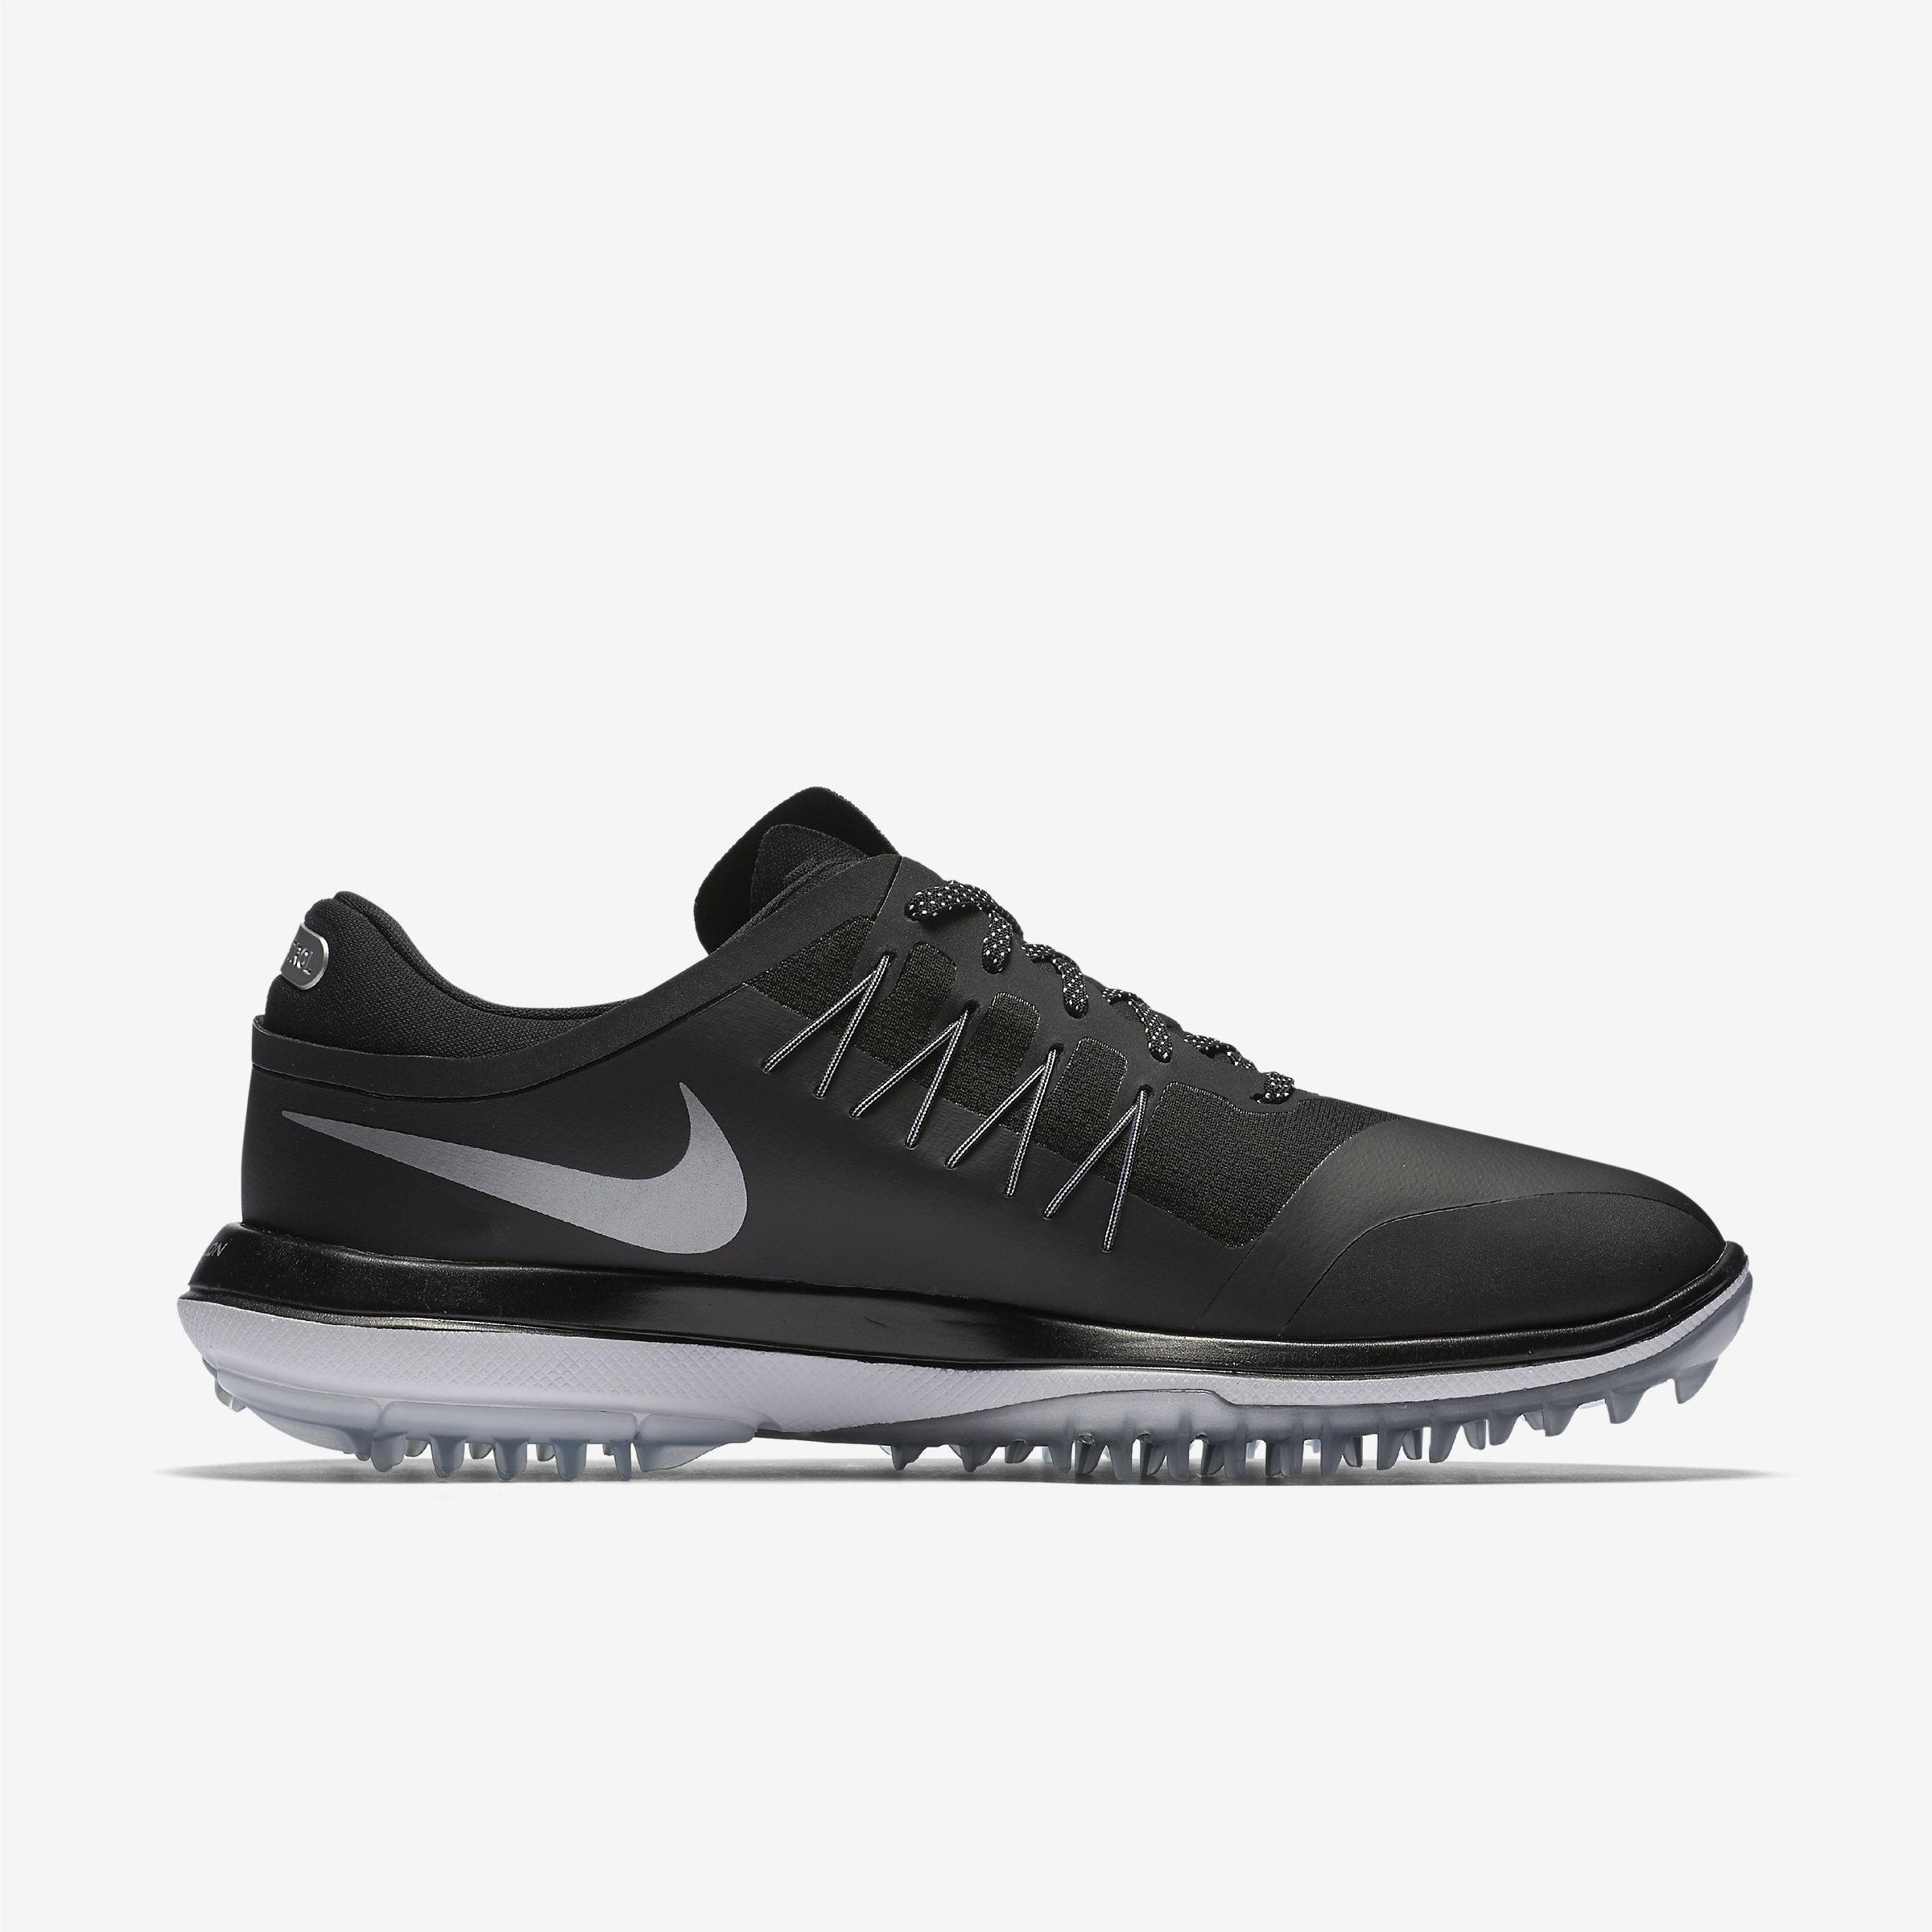 Nike Synthetic Lunar Control Vapor in Black,White,Metallic Silver (Black) for Men